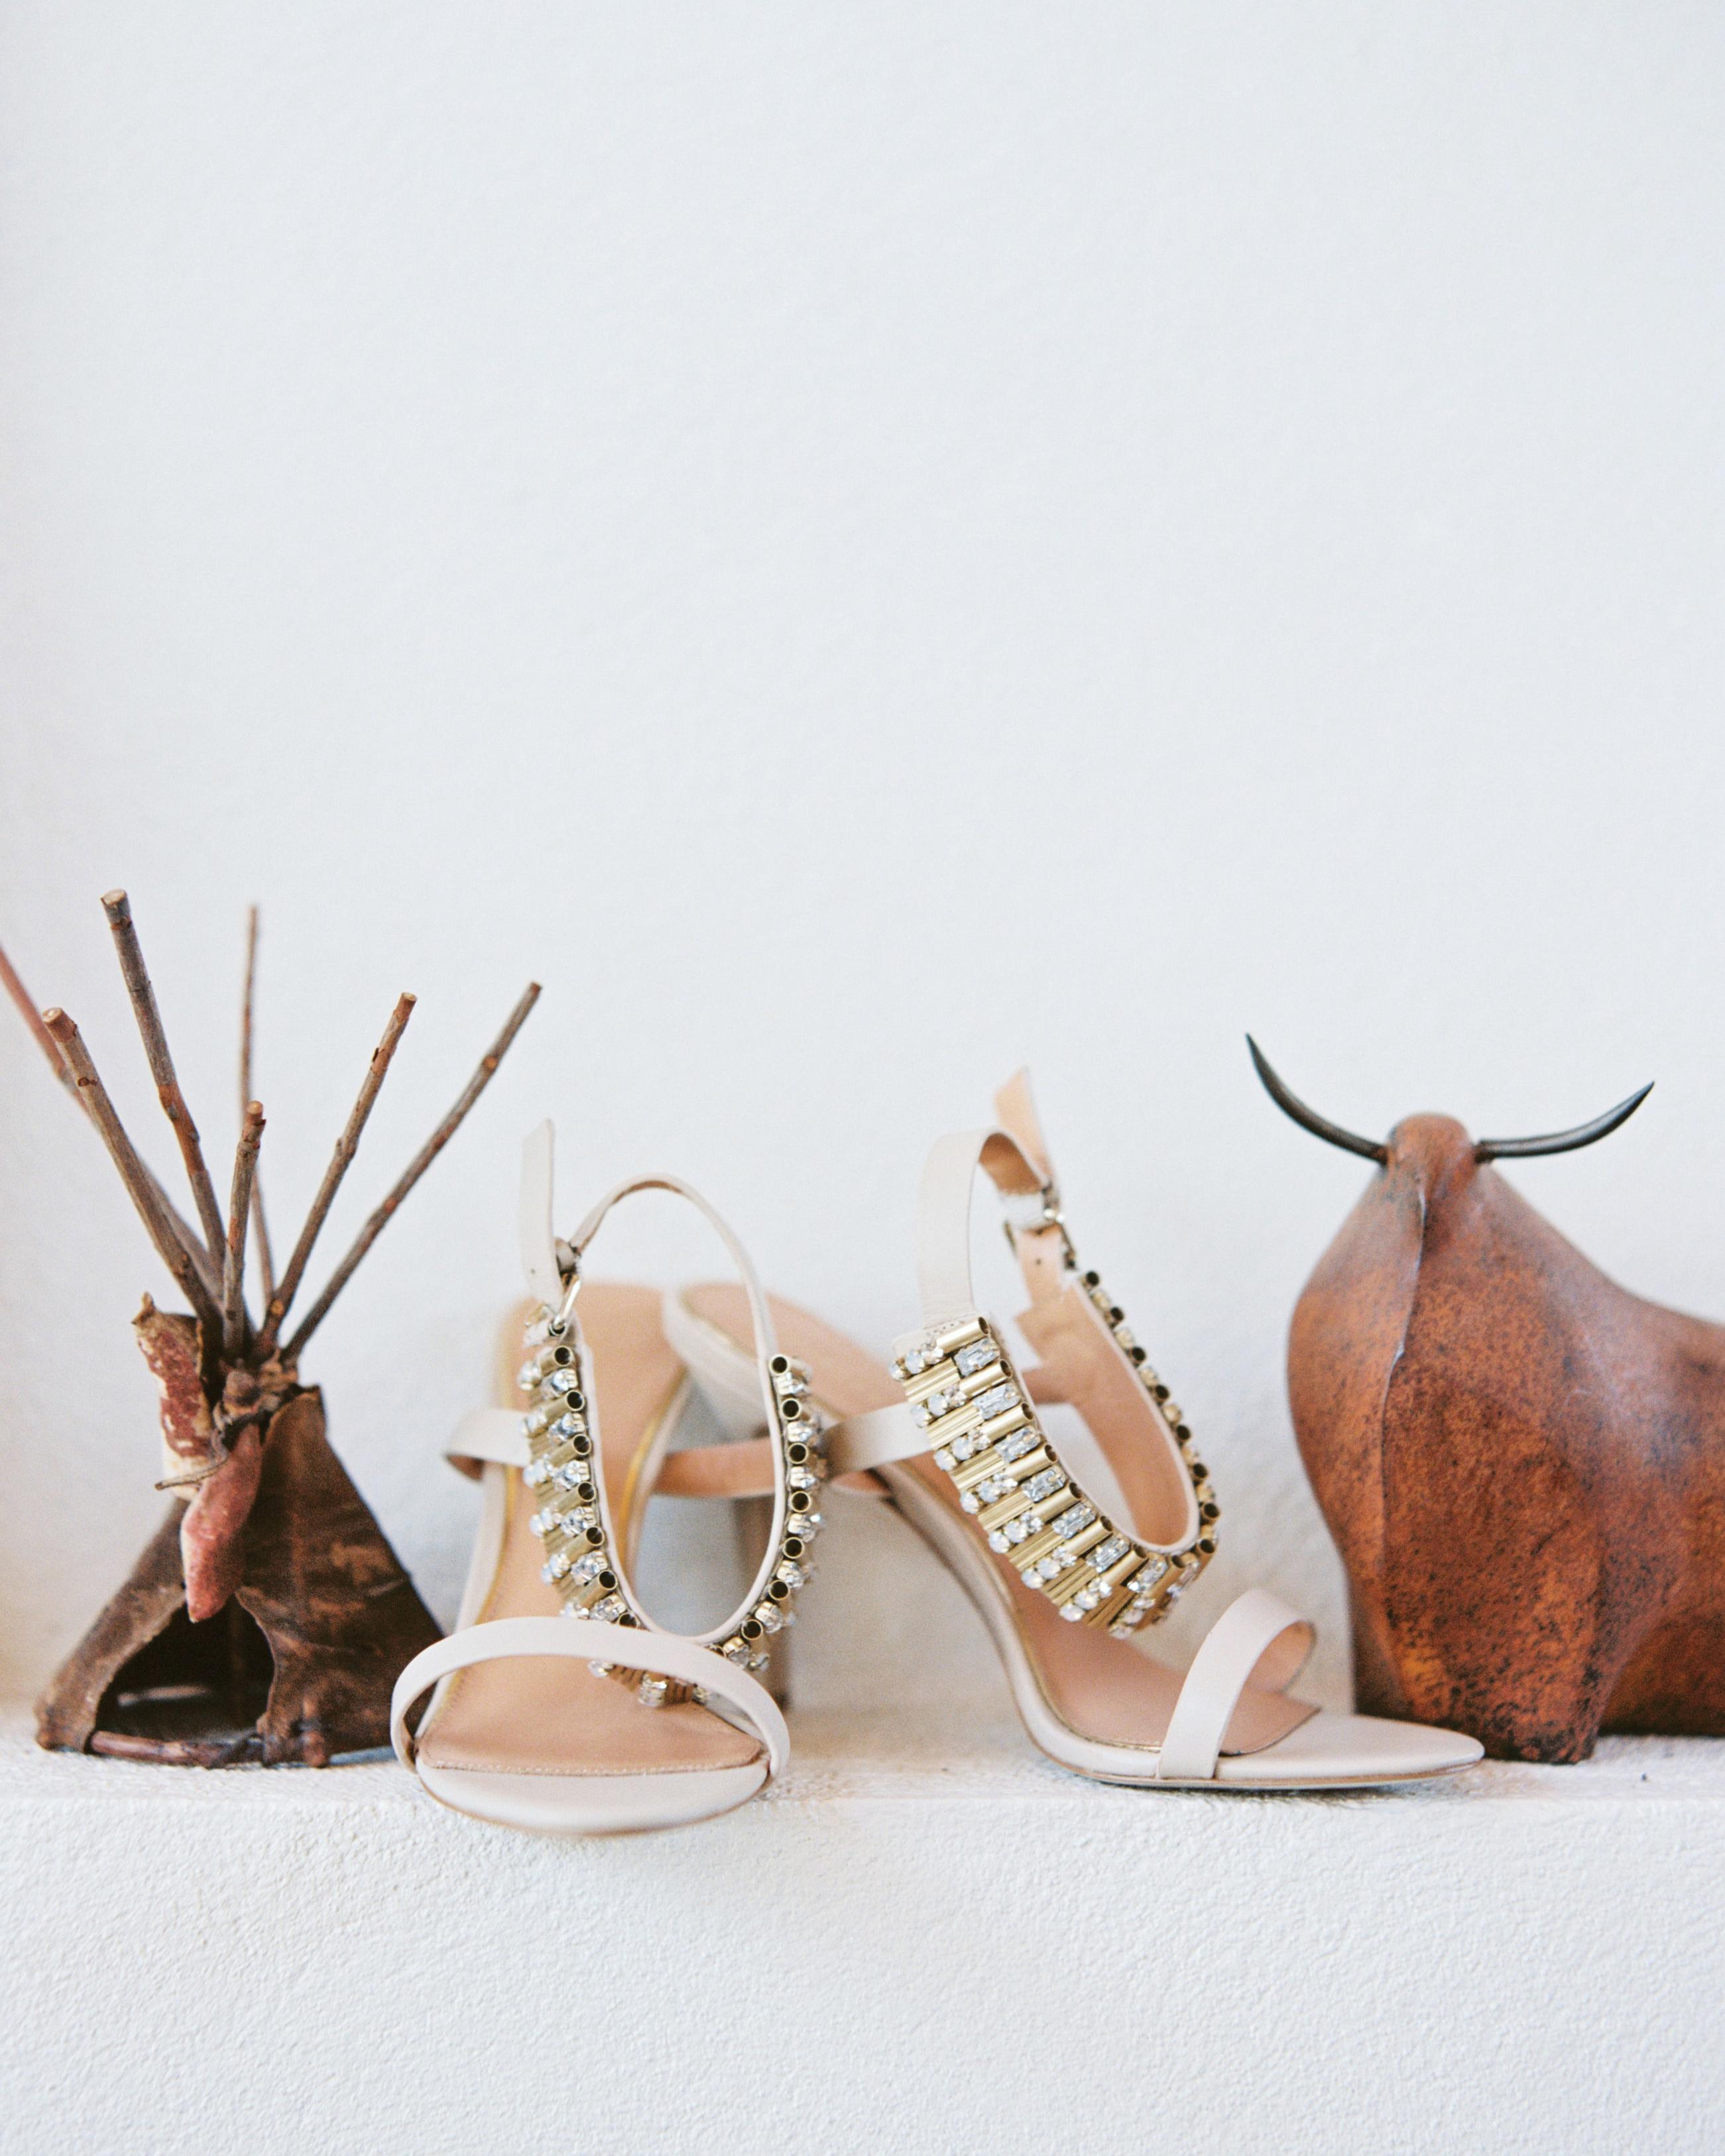 lara-chad-wedding-shoes-032-s112306-1115.jpg